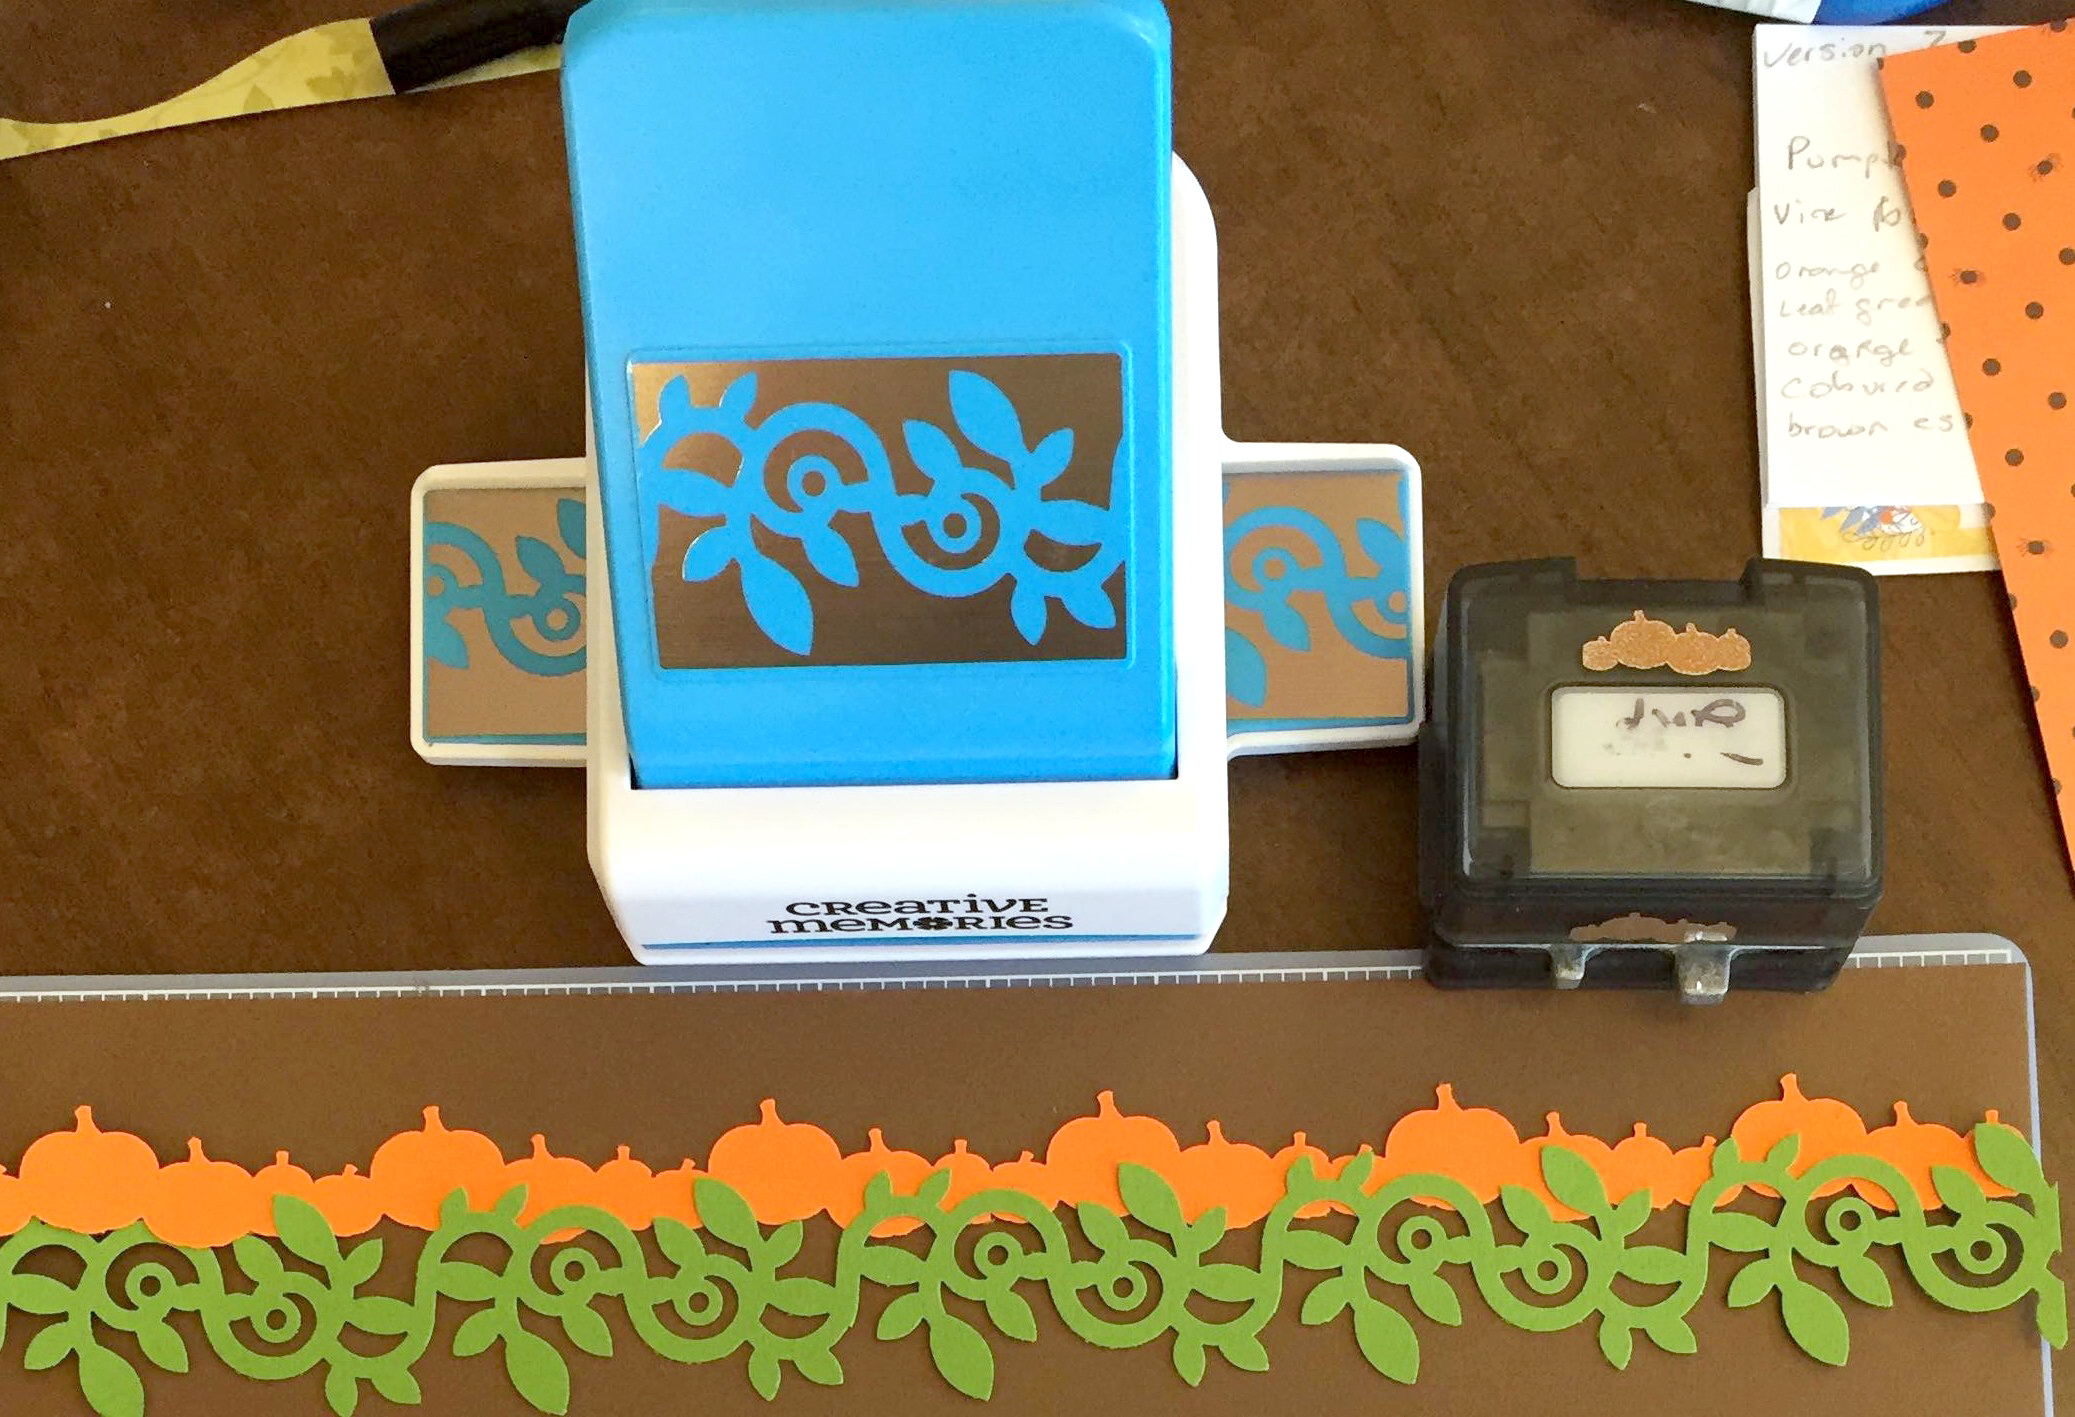 Virtual-Crop-Challenge6-Pumpkin-Spice-Process3-Creative-Memories_retouched